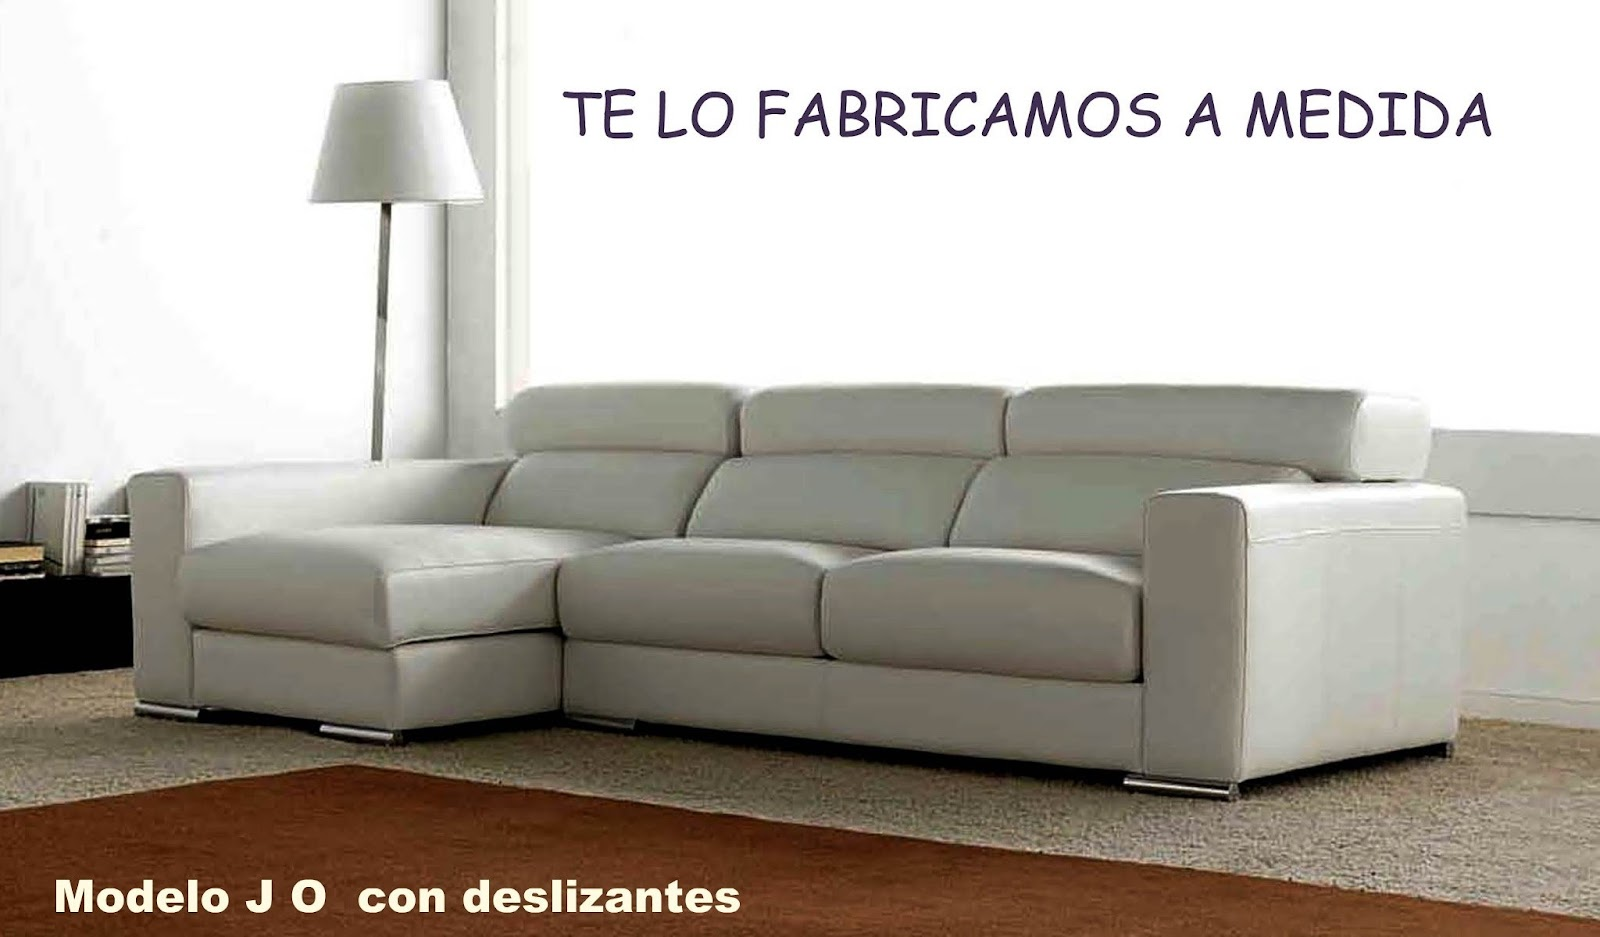 Sofas y muebles a medida en barcelona chaise longue barcelona for Medidas sofa cheslong